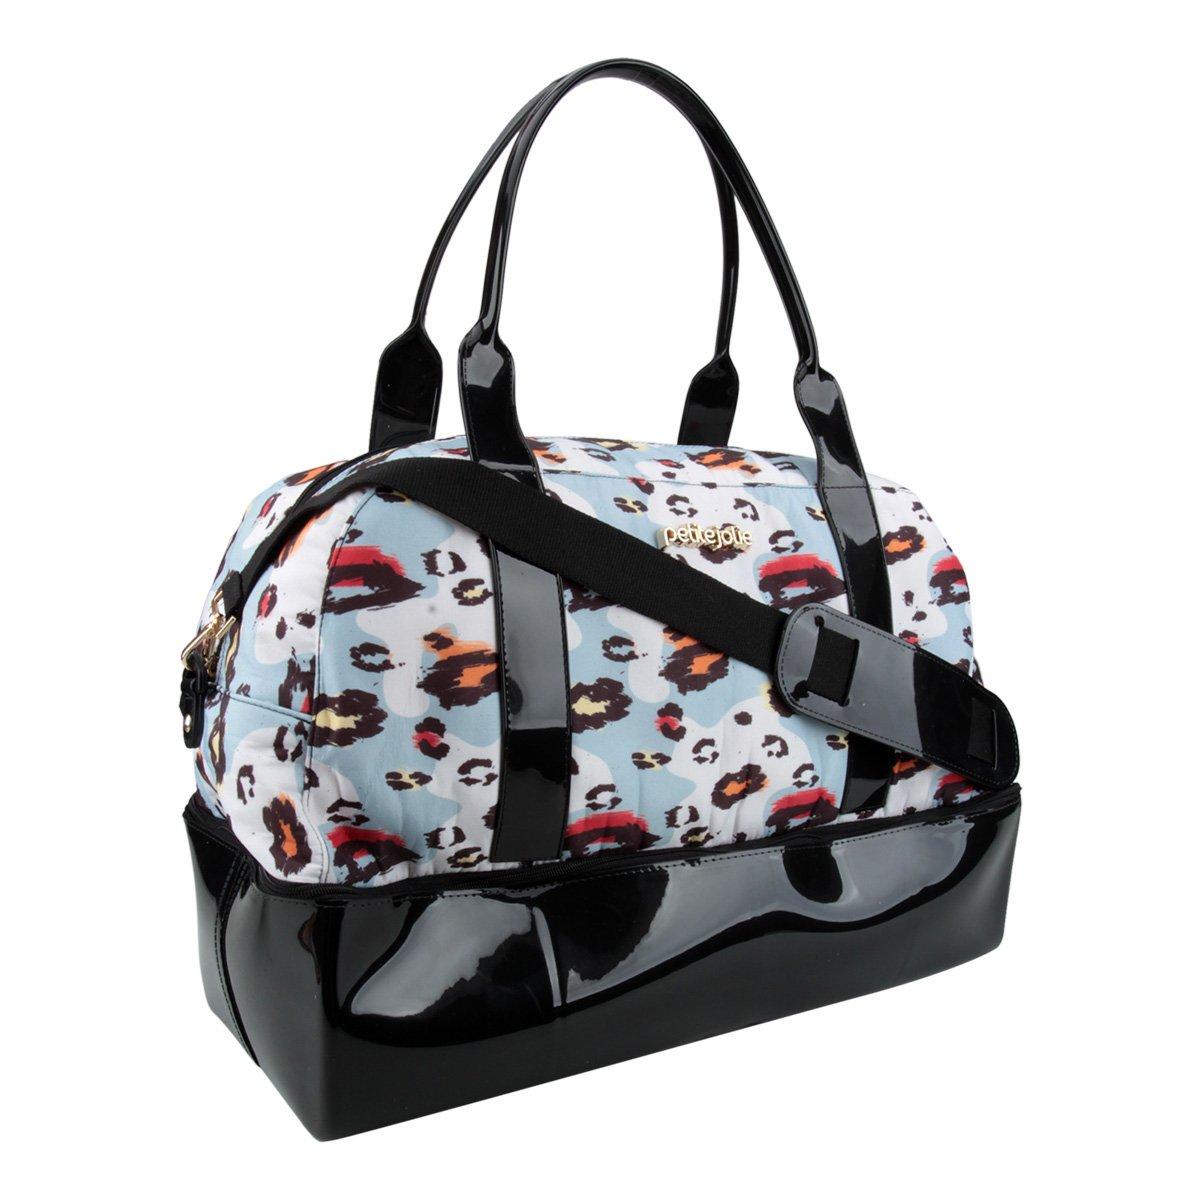 Feminina Bolsa e Petite Handbag Petite Weekend Azul Bolsa Preto Jolie wfFxFZn